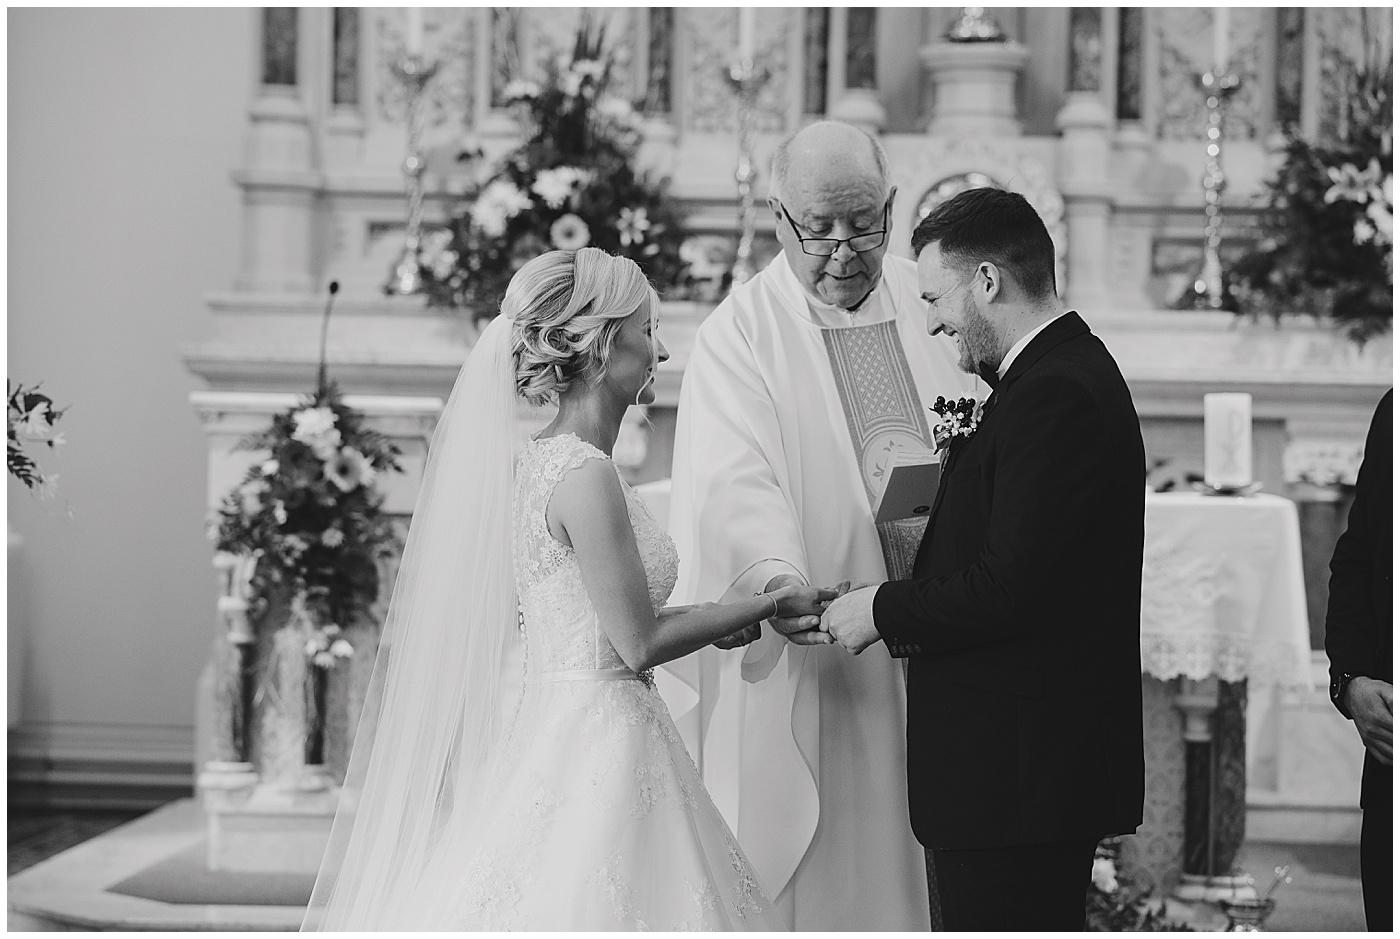 lissan-house-wedding-jude-browne-photography_0045.jpg